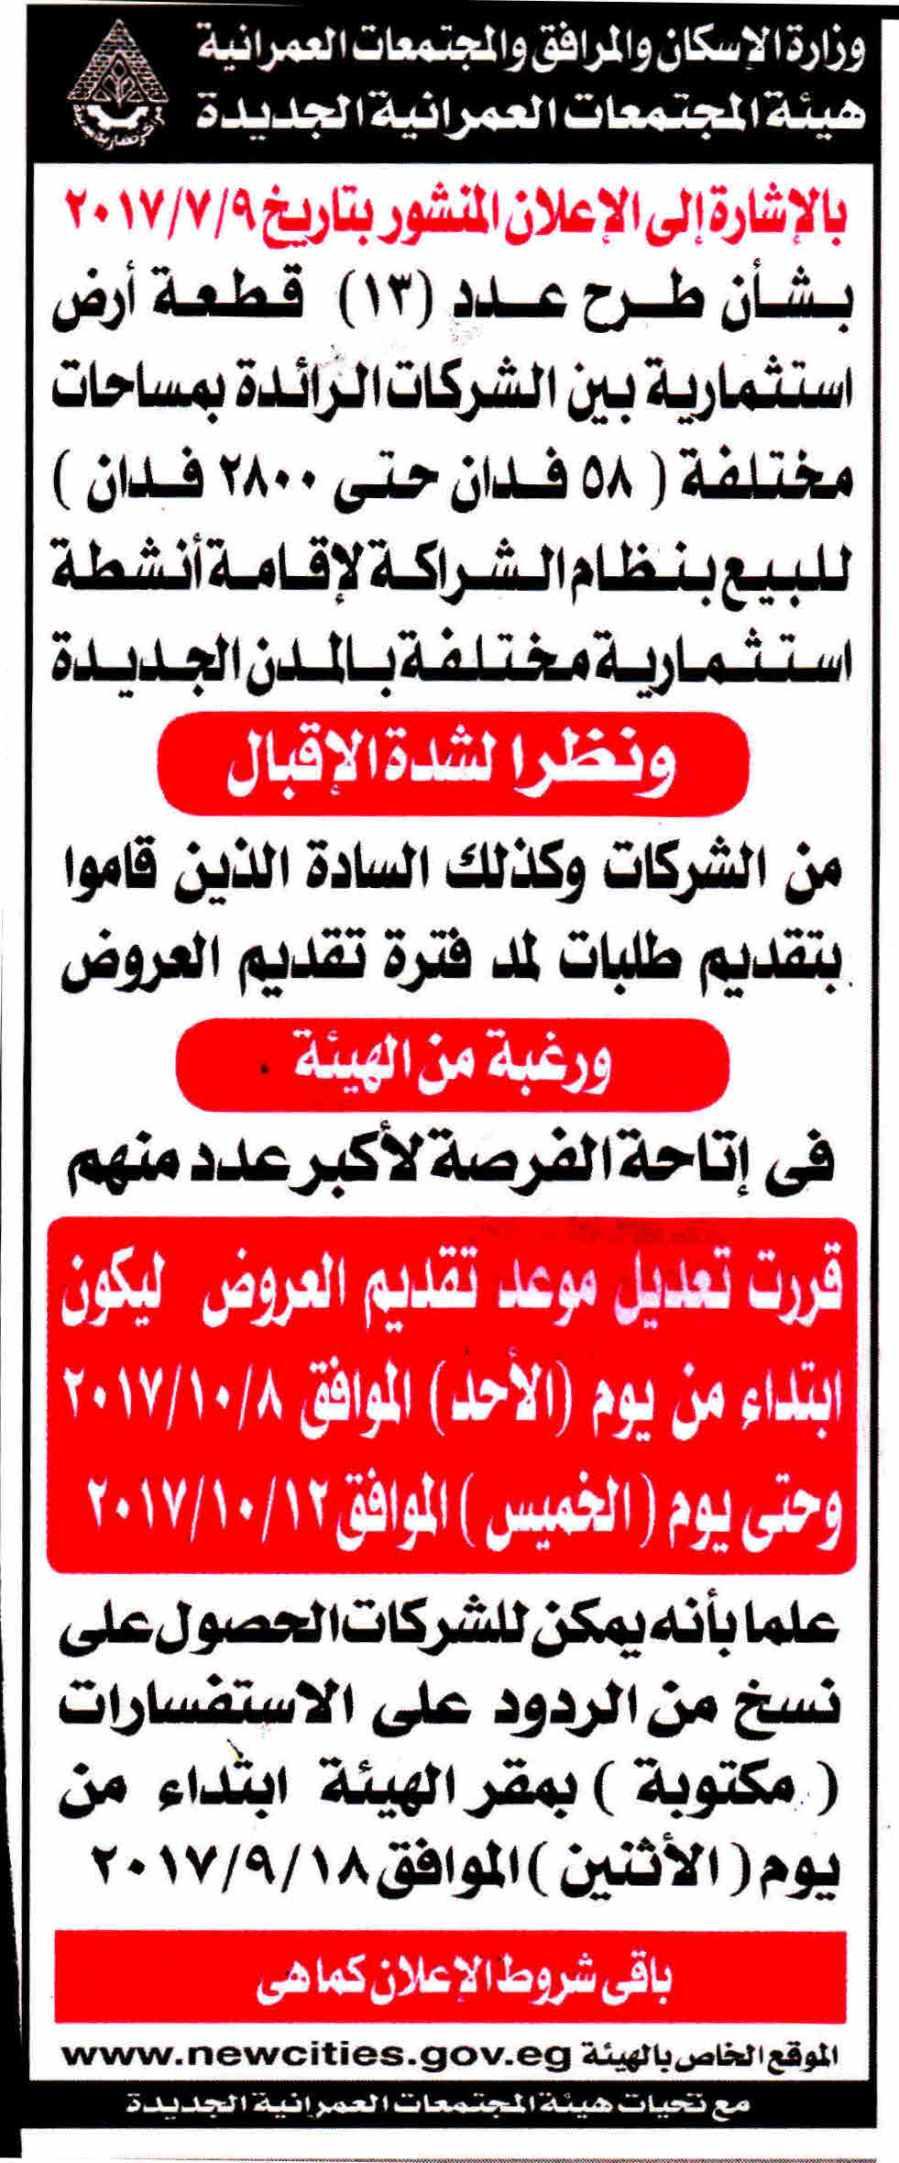 Al Ahram 12 Sep P.1.jpg